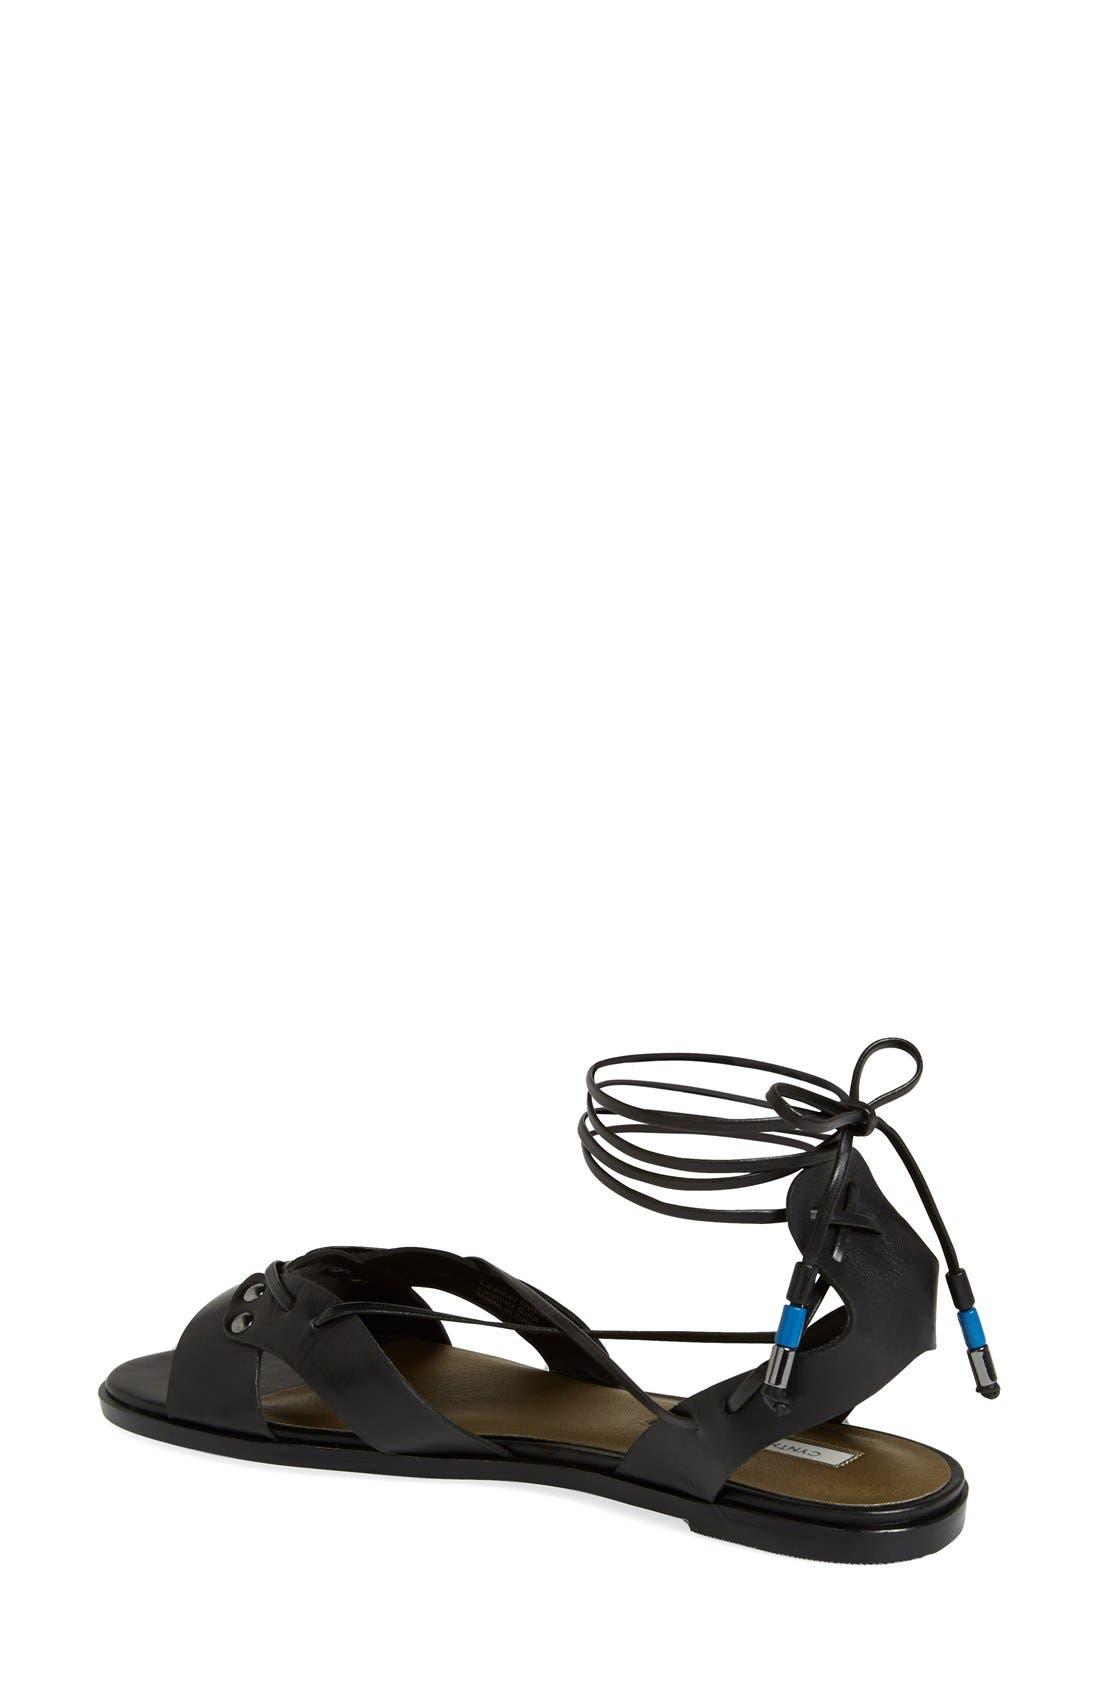 Alternate Image 2  - Cynthia Vincent 'Fantine' Leather Gladiator Sandal (Women)